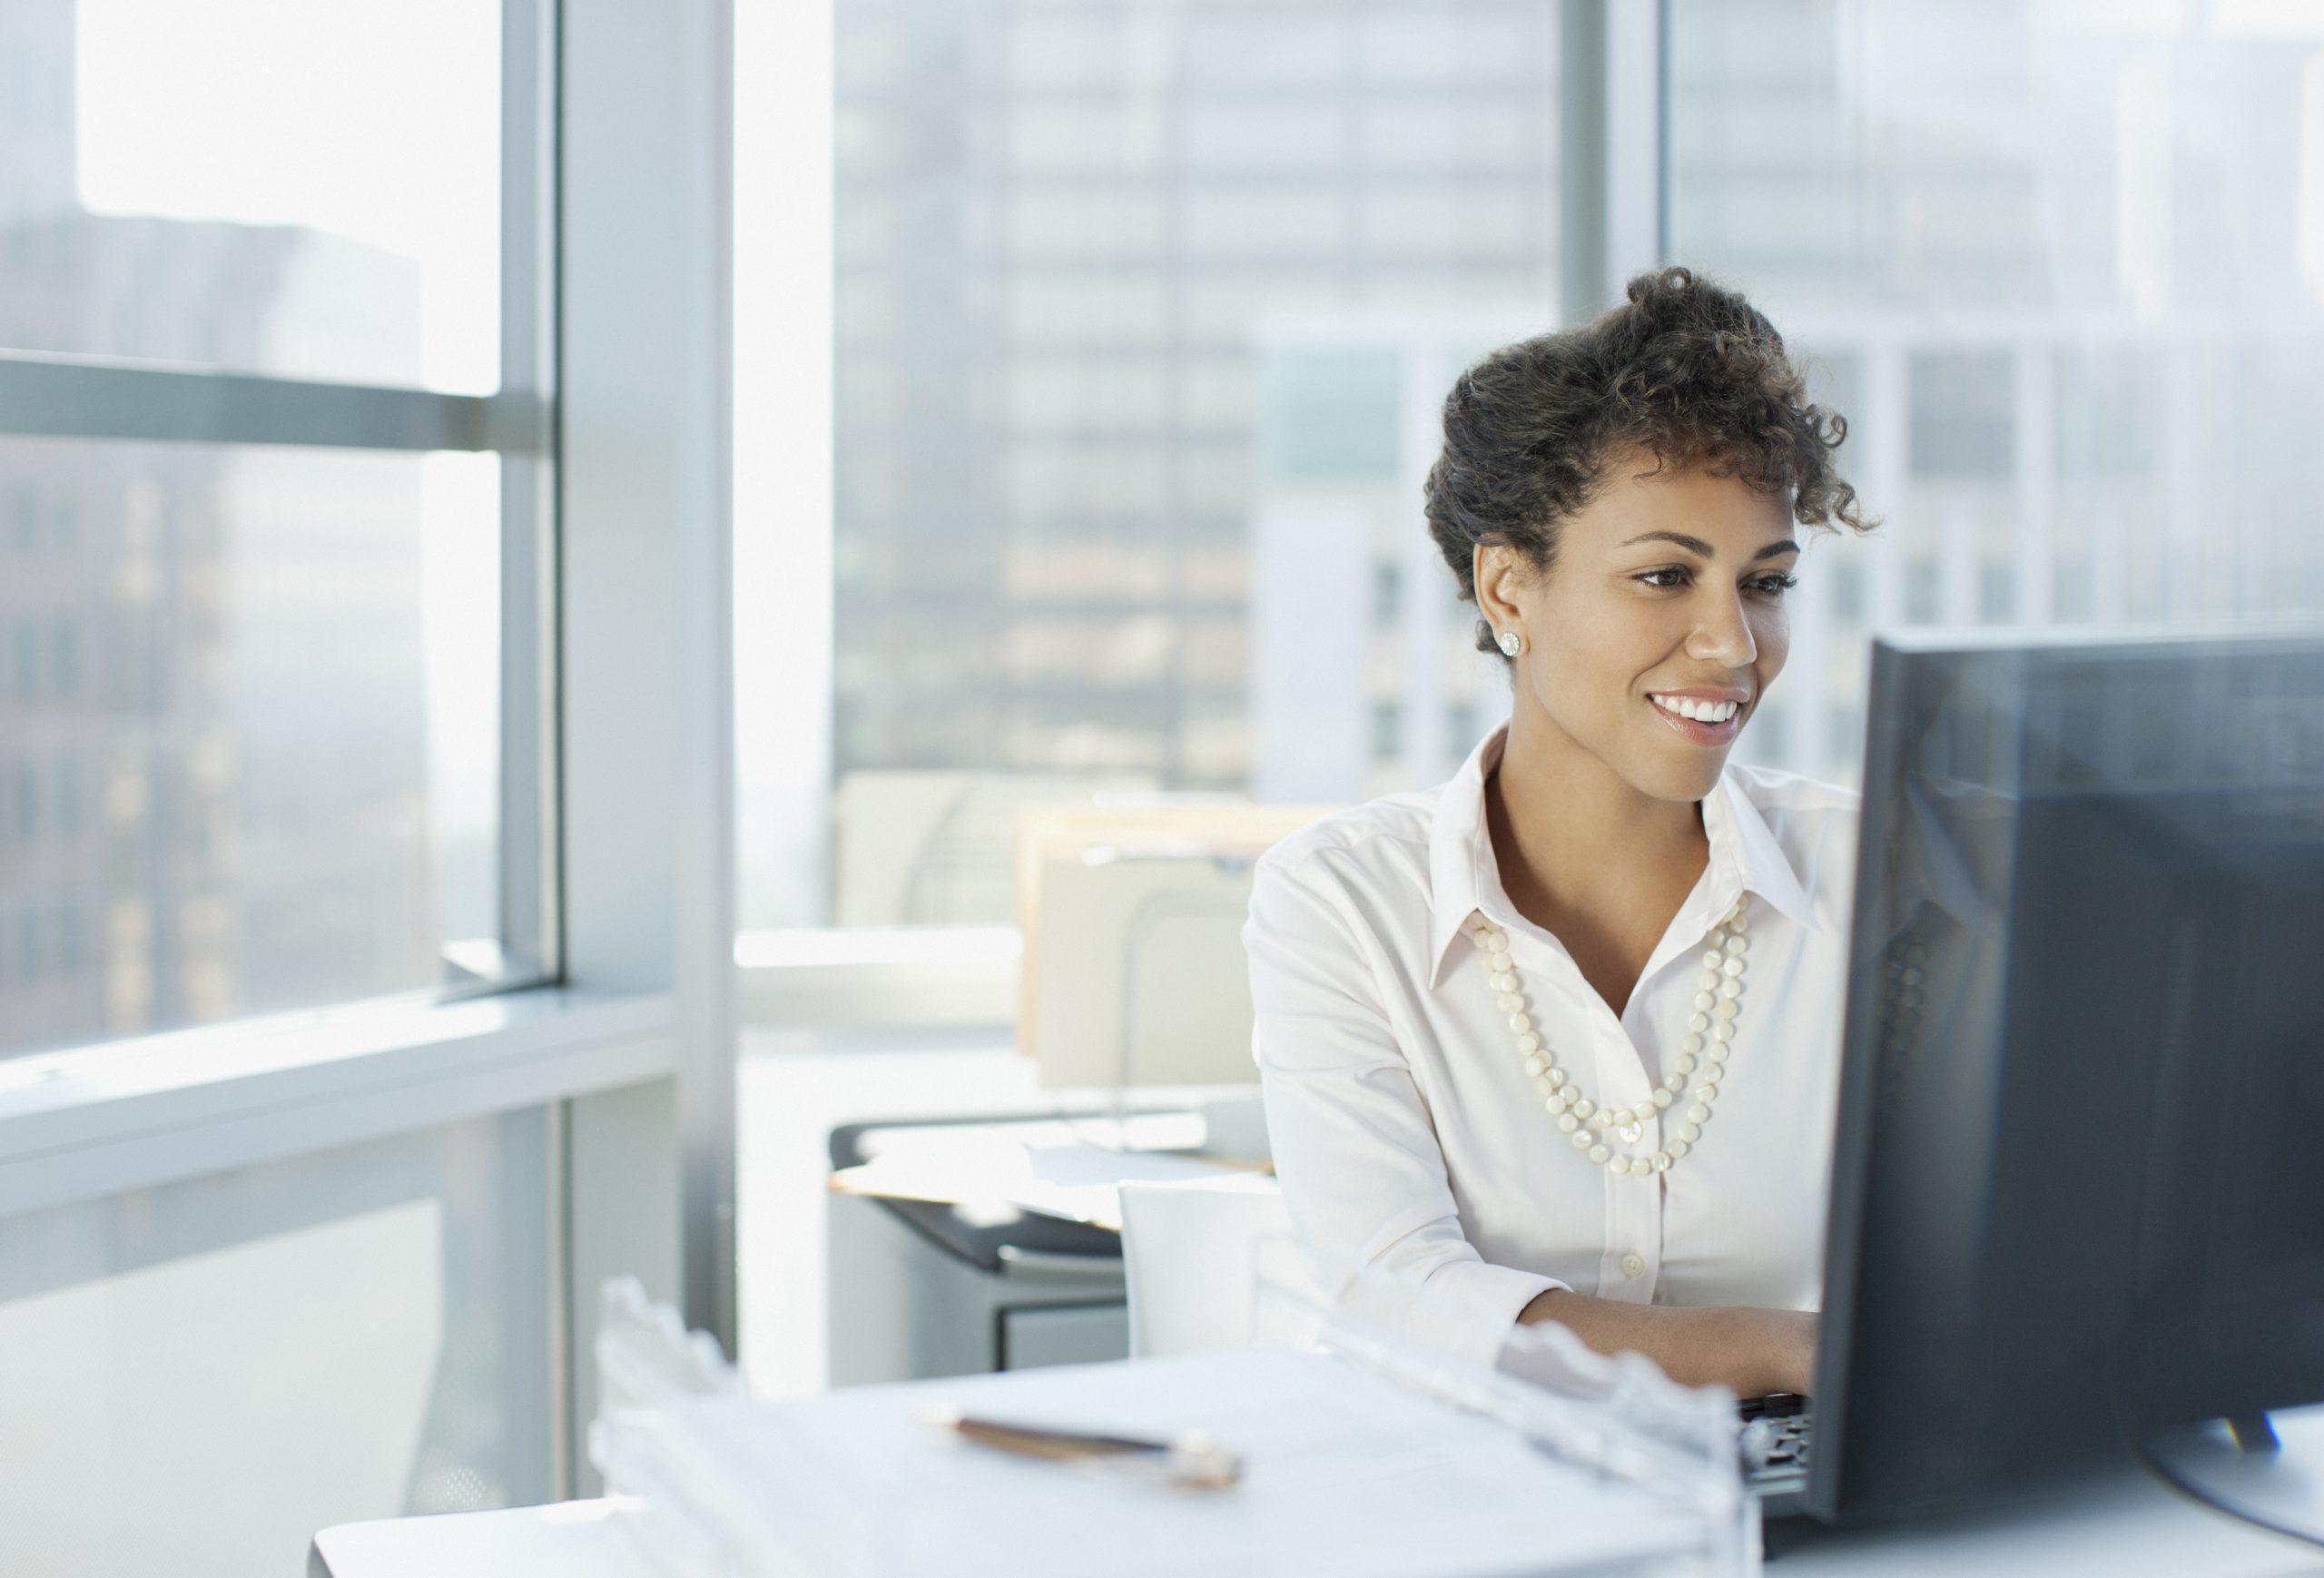 Businesswoman going through her daily routine